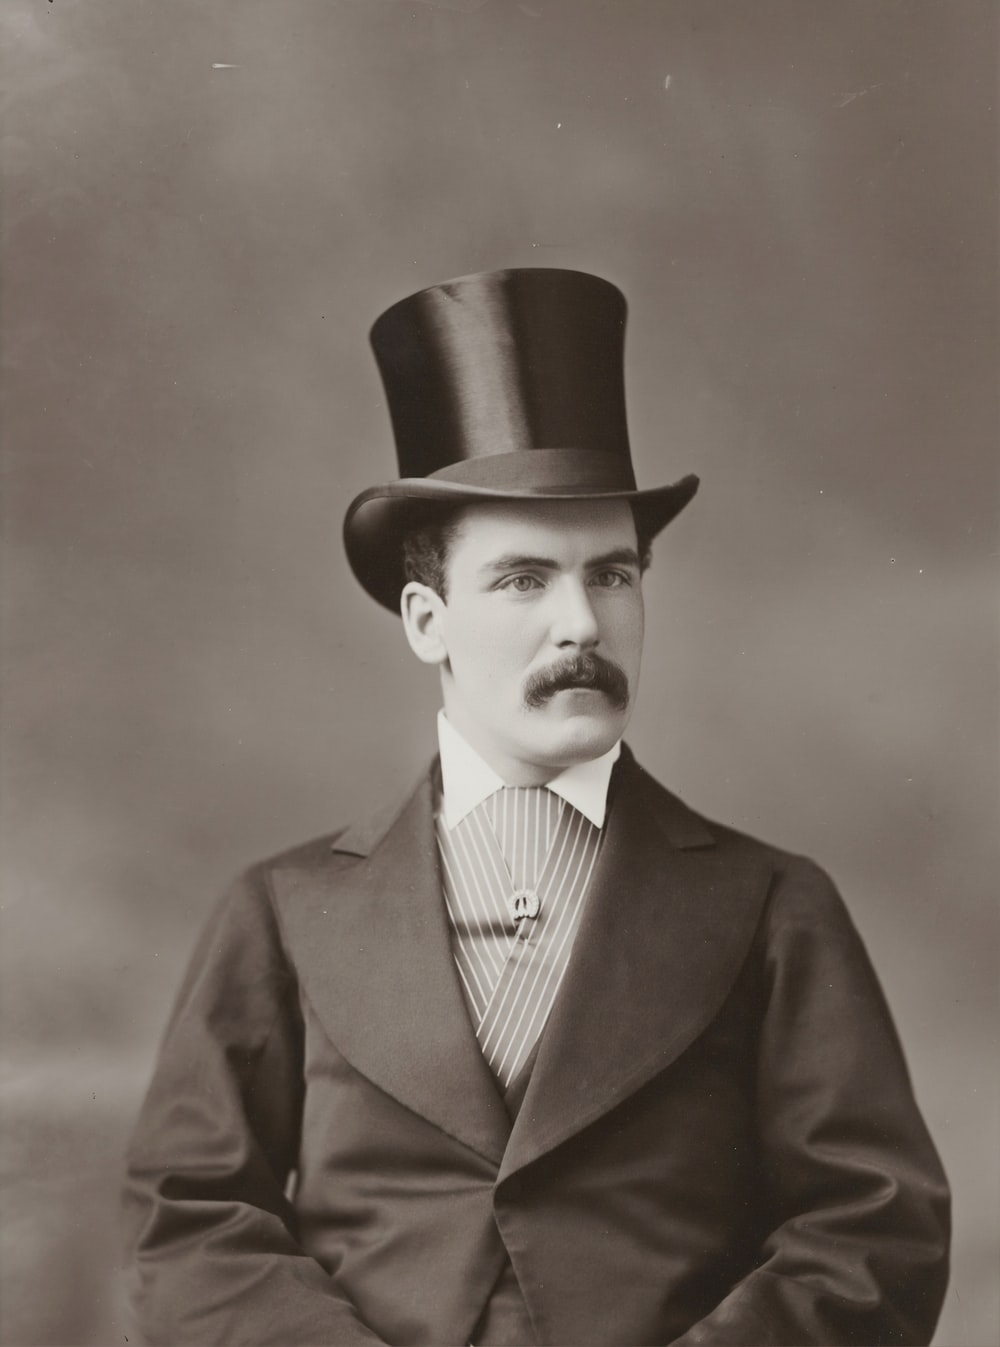 Dr. Thomas Neill Cream portrait